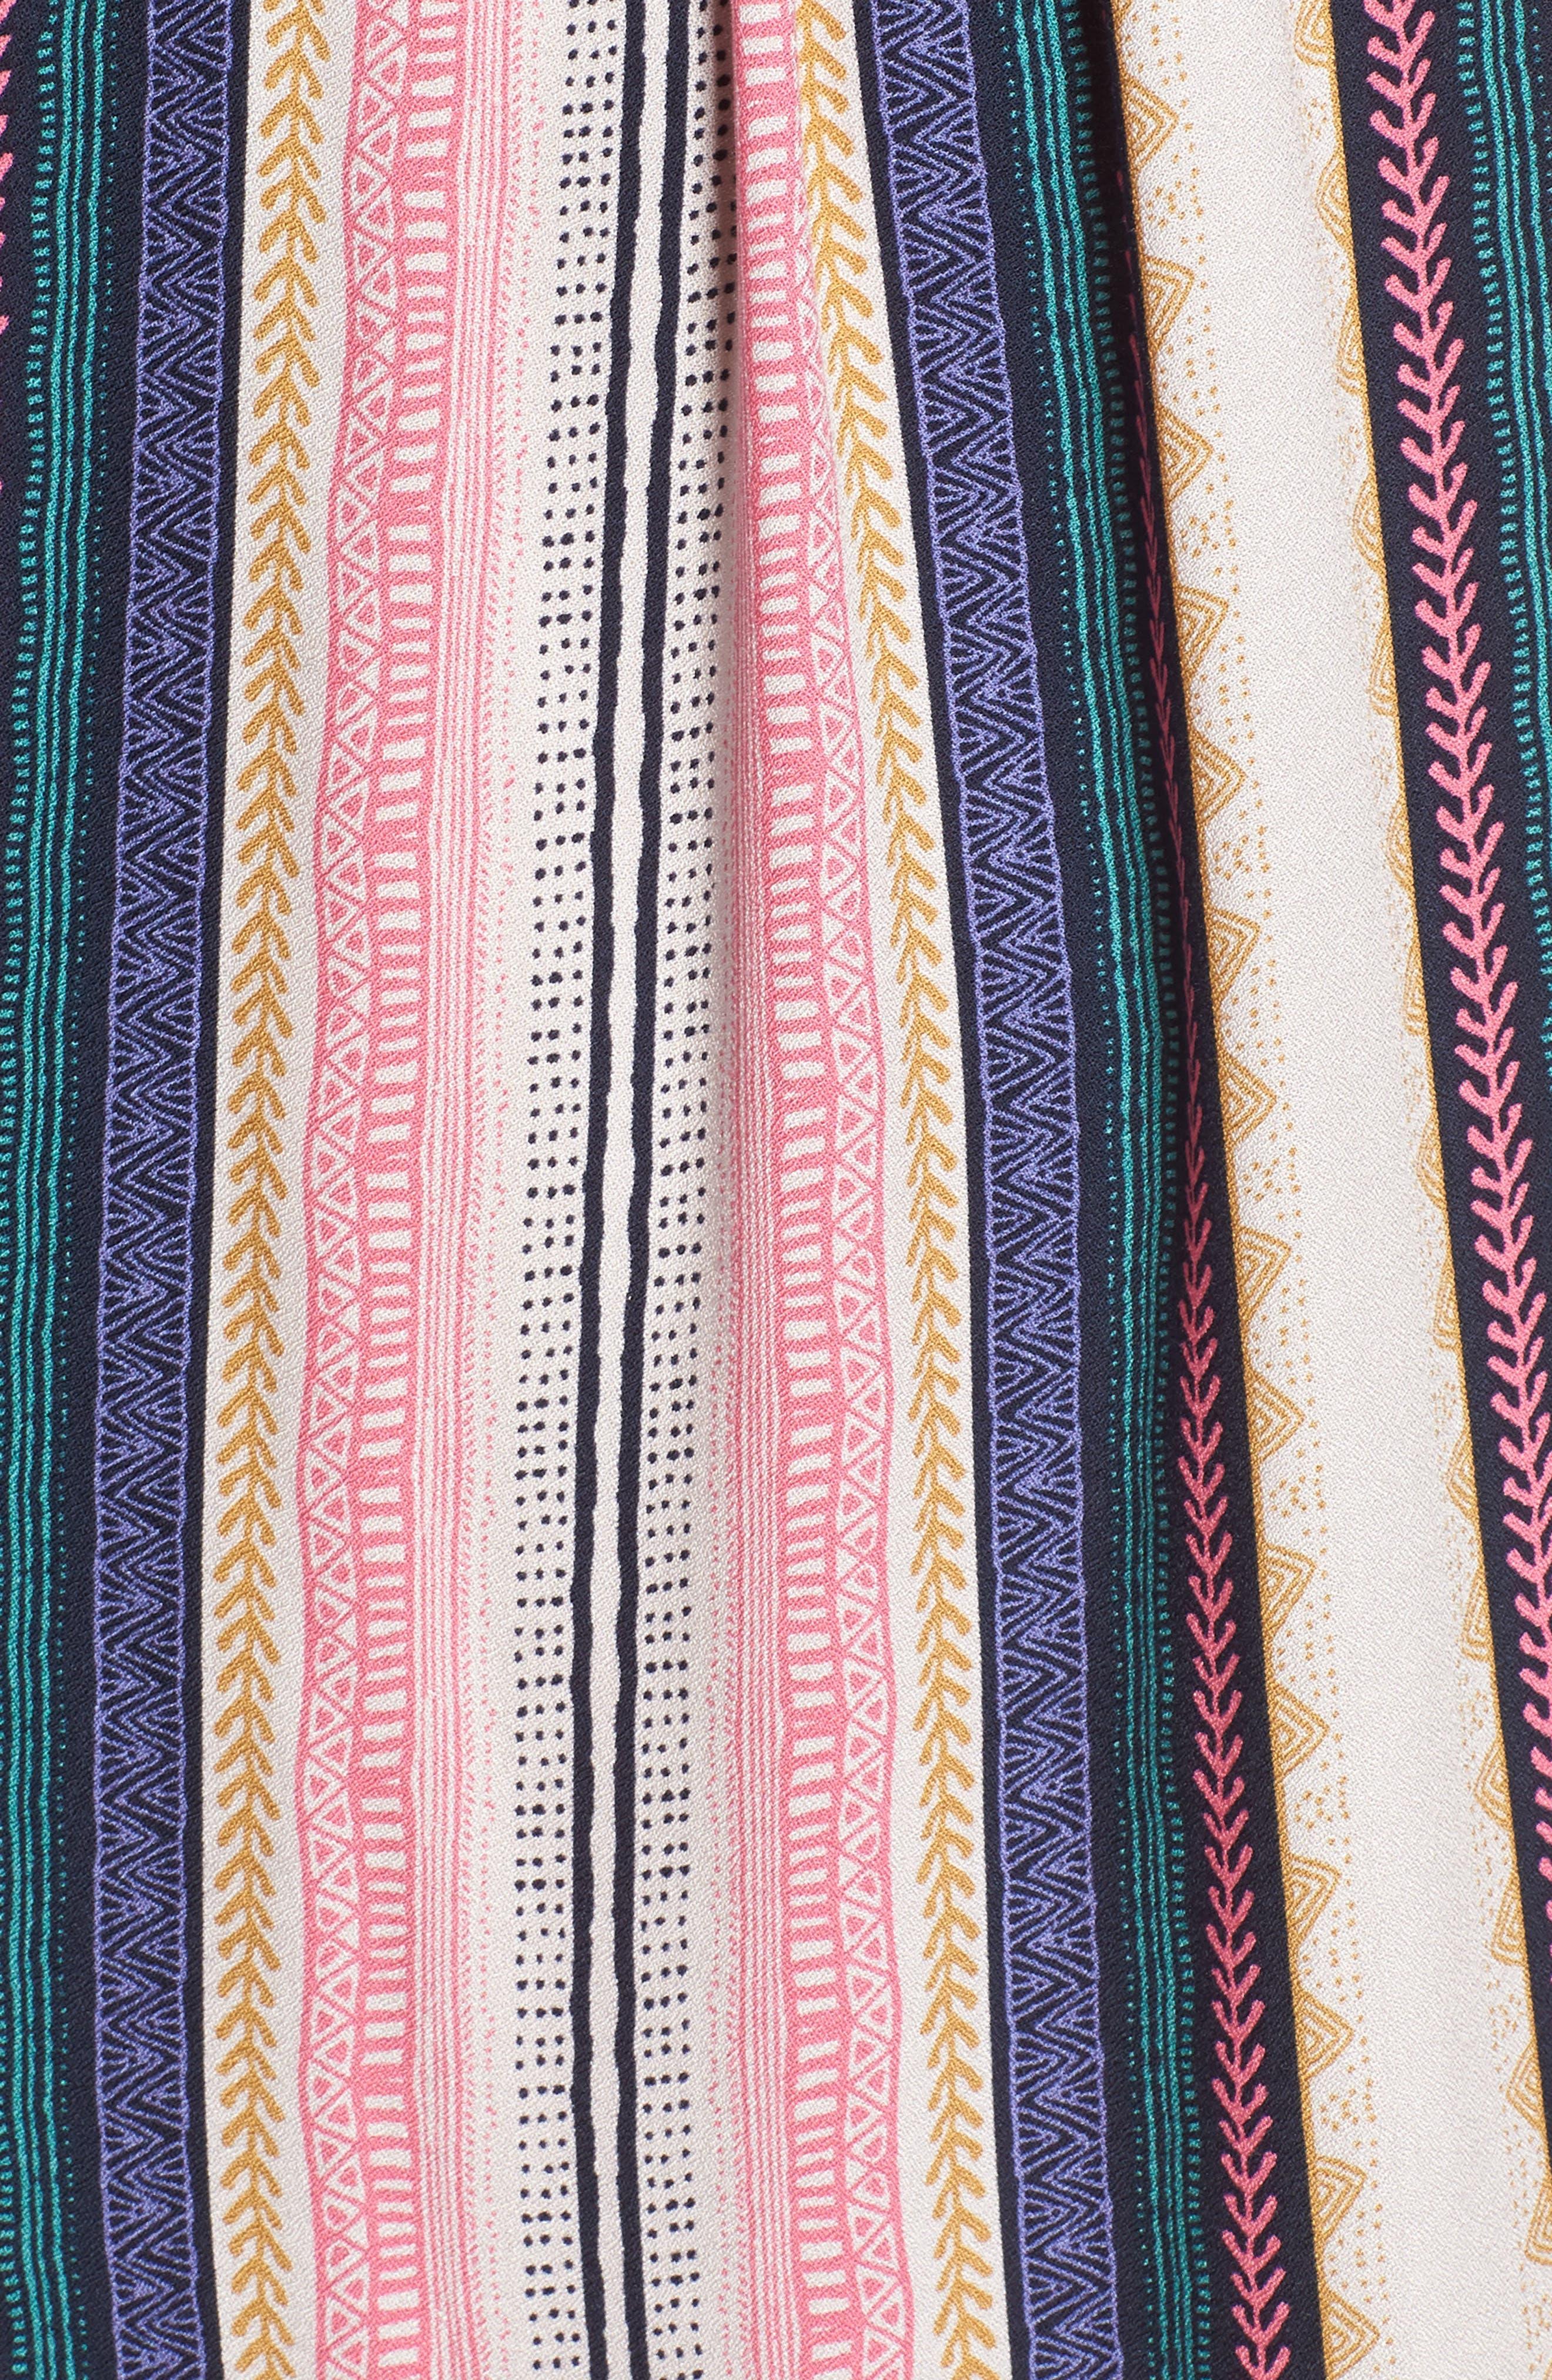 ONE CLOTHING,                             Stripe Maxi Dress,                             Alternate thumbnail 5, color,                             650